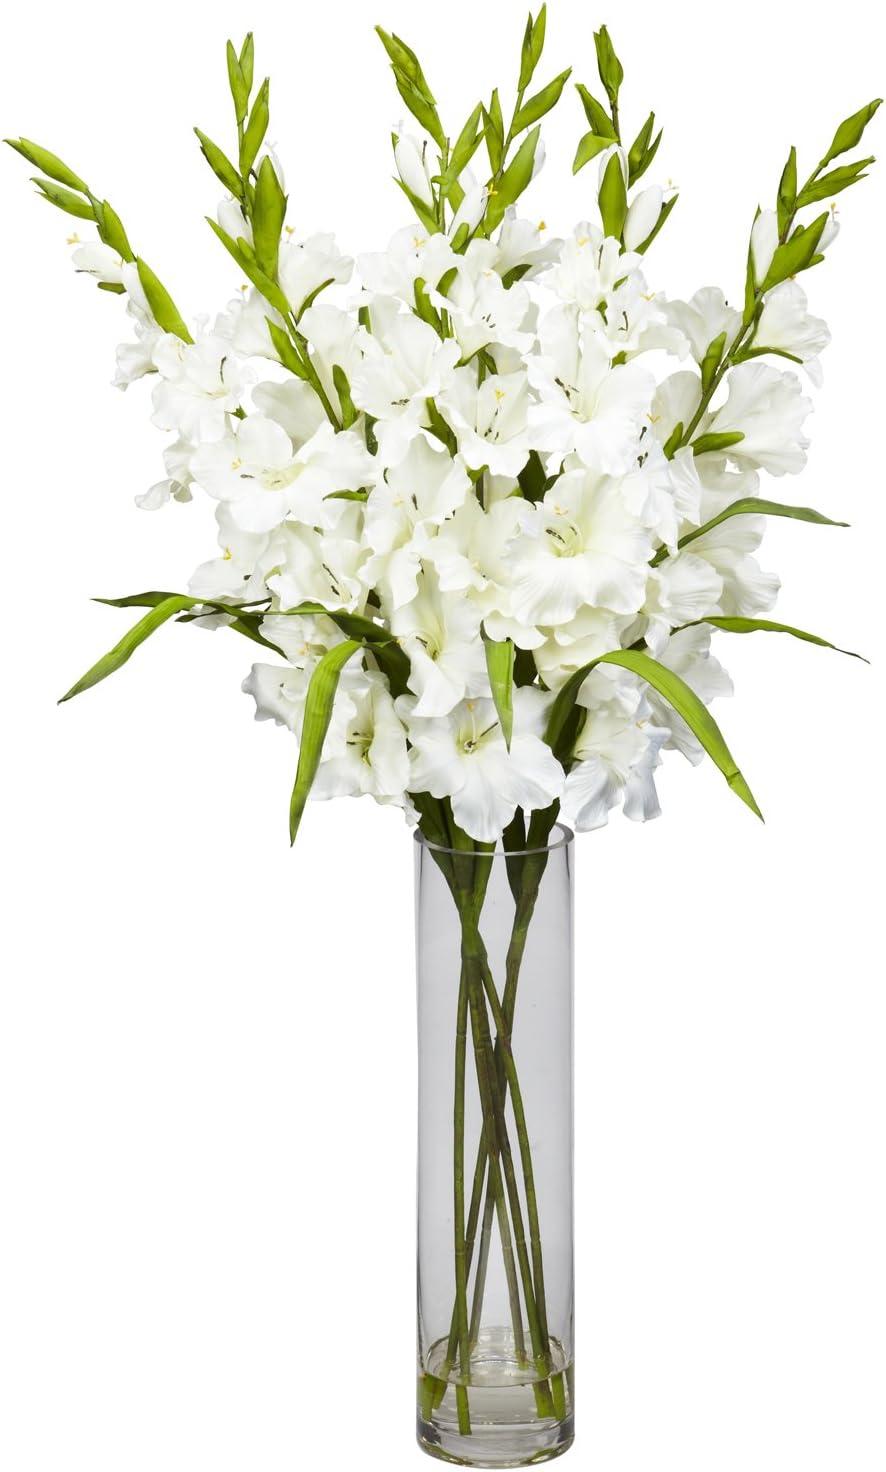 Amazon Com Nearly Natural 1240 Wh Large Gladiola With Cylinder Vase Silk Flower Arrangement White 42 X 11 X 11 Home Kitchen